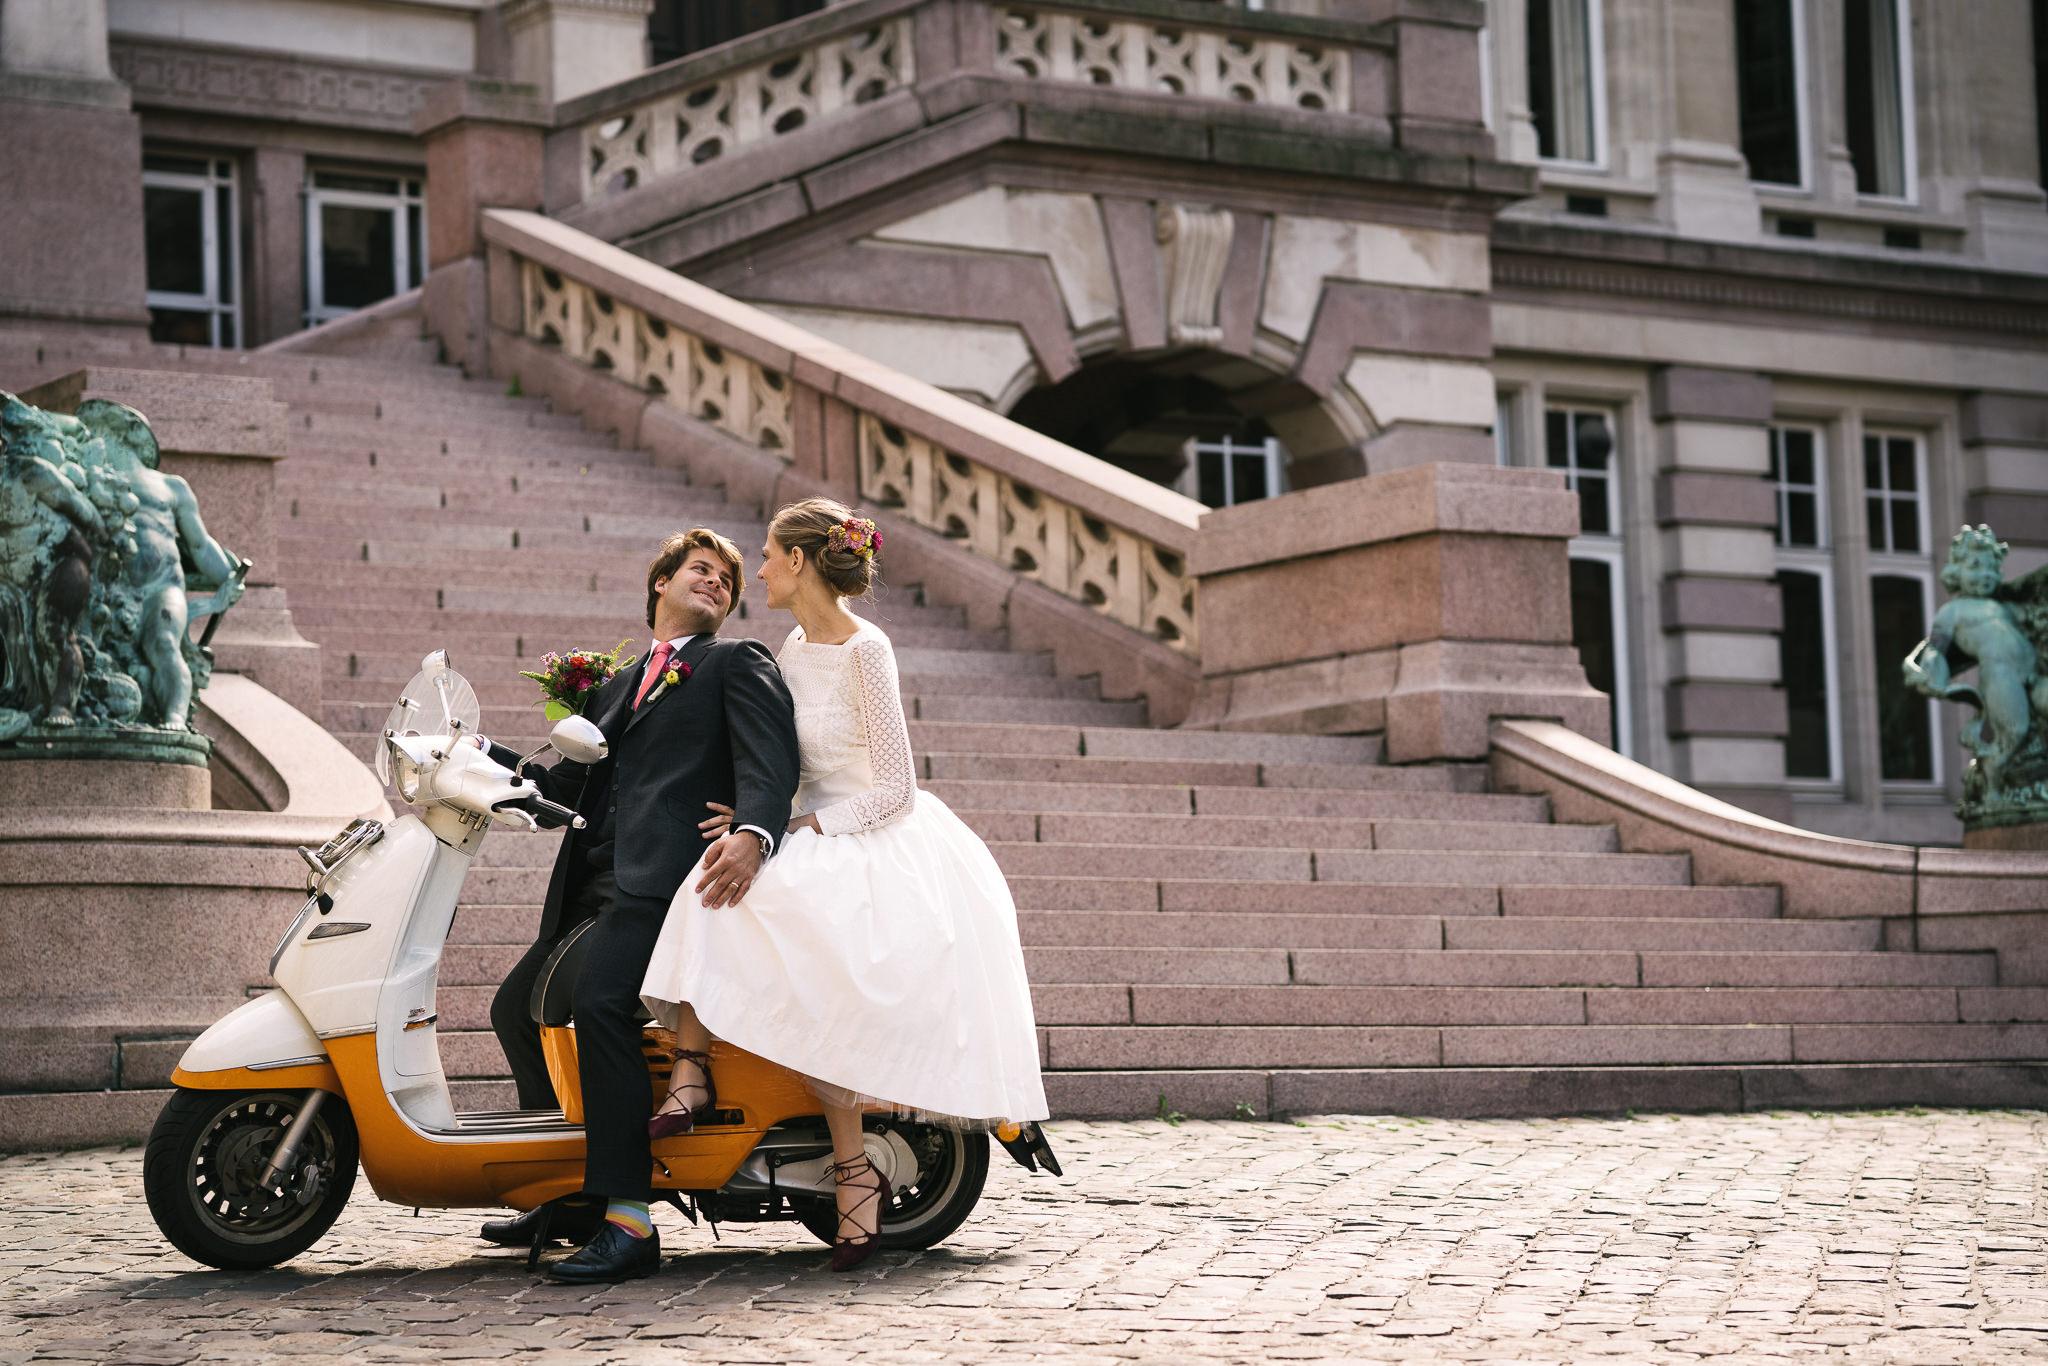 Wedding-Claudia&Philipp-15092018-small-111.jpg